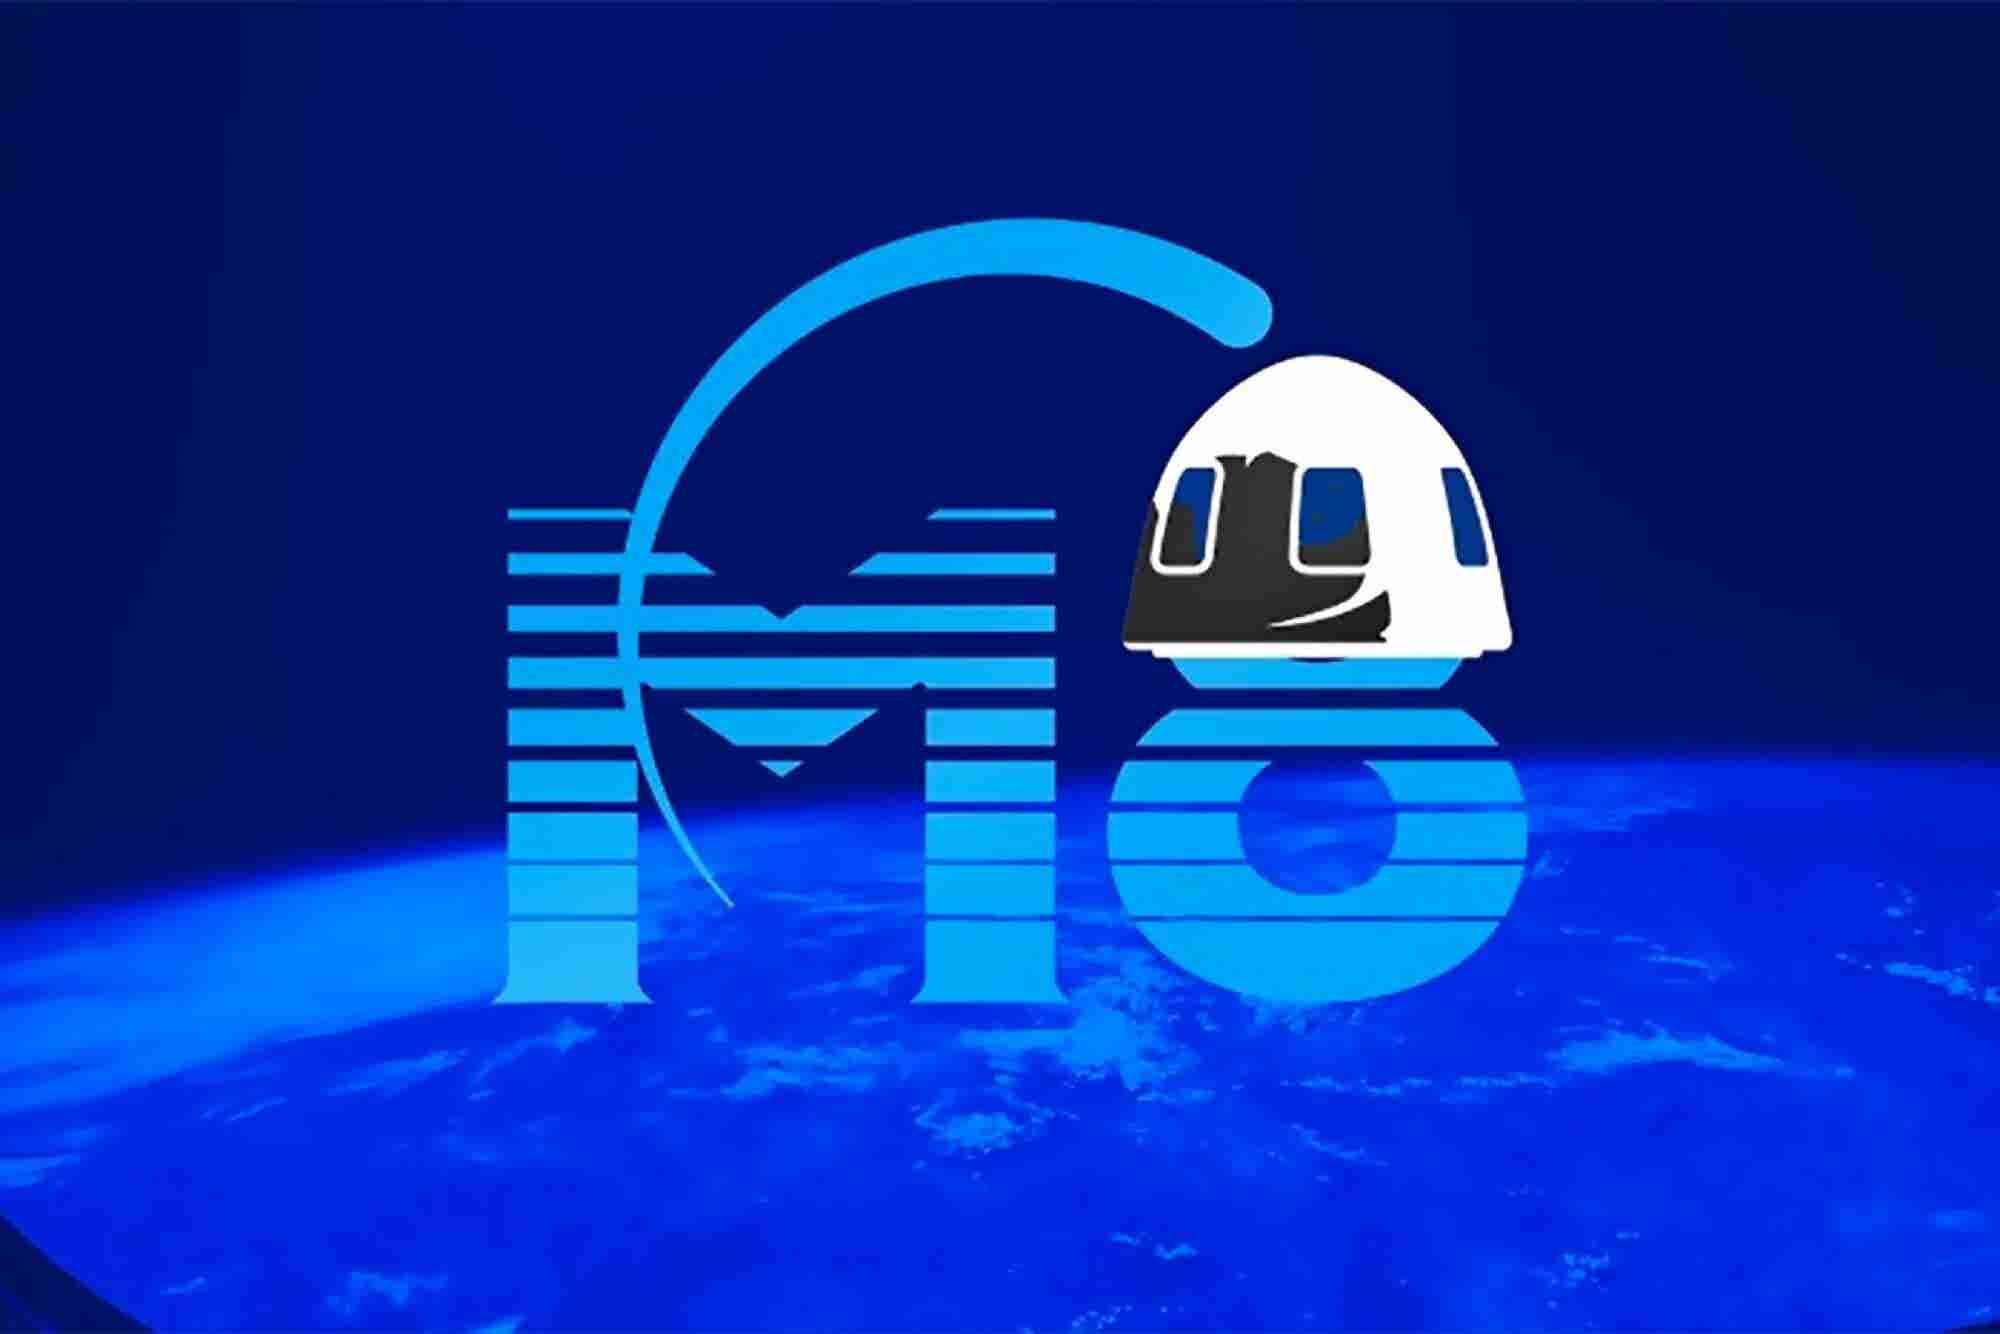 Jeff Bezos's Blue Origin Launches and Lands Its Rocket